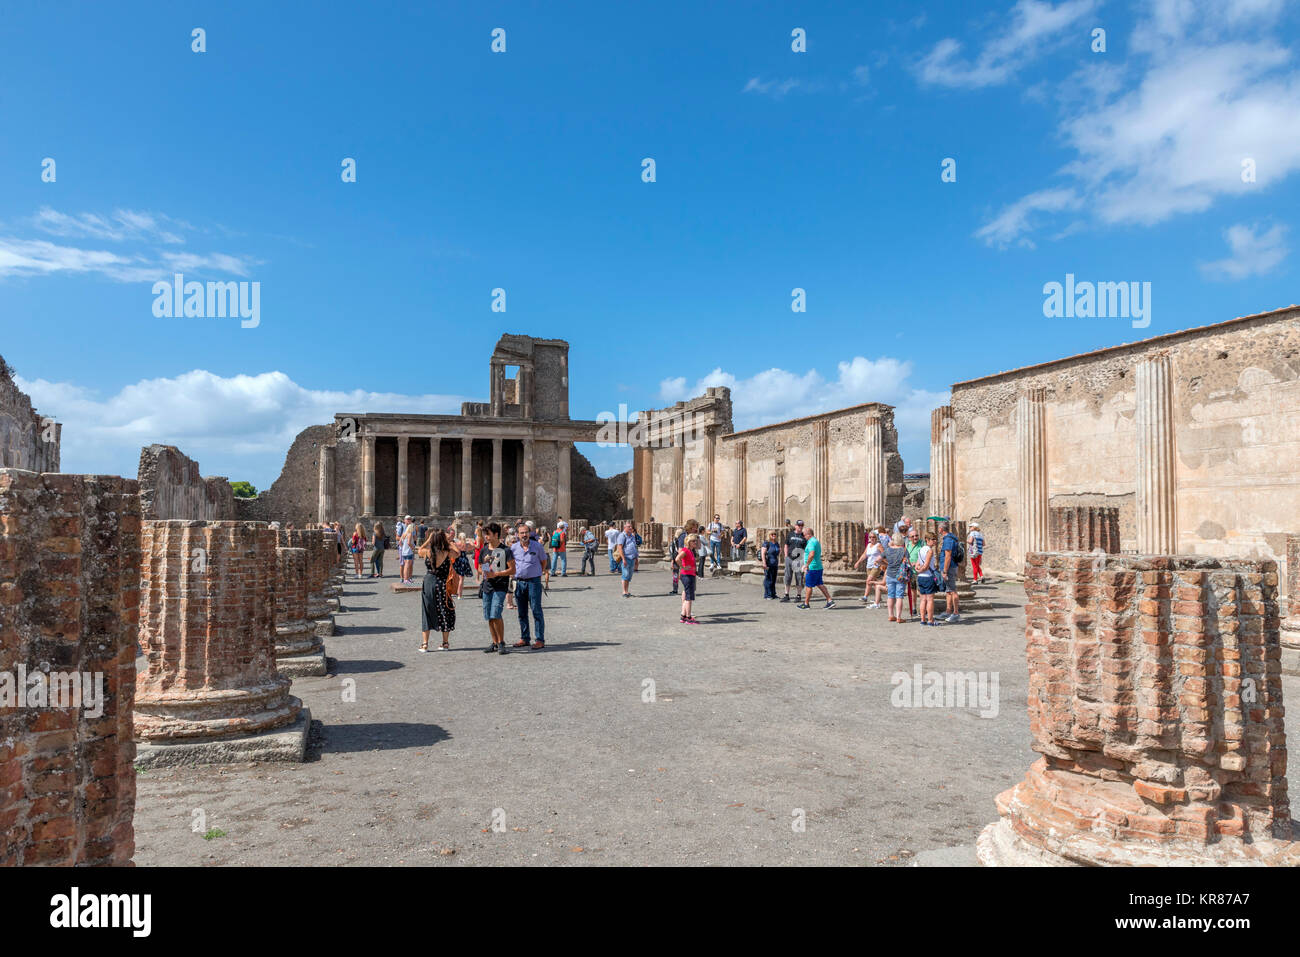 Tourists in the ruins of the Roman Forum at Pompeii ( Pompei ), Naples, Campania,Italy - Stock Image